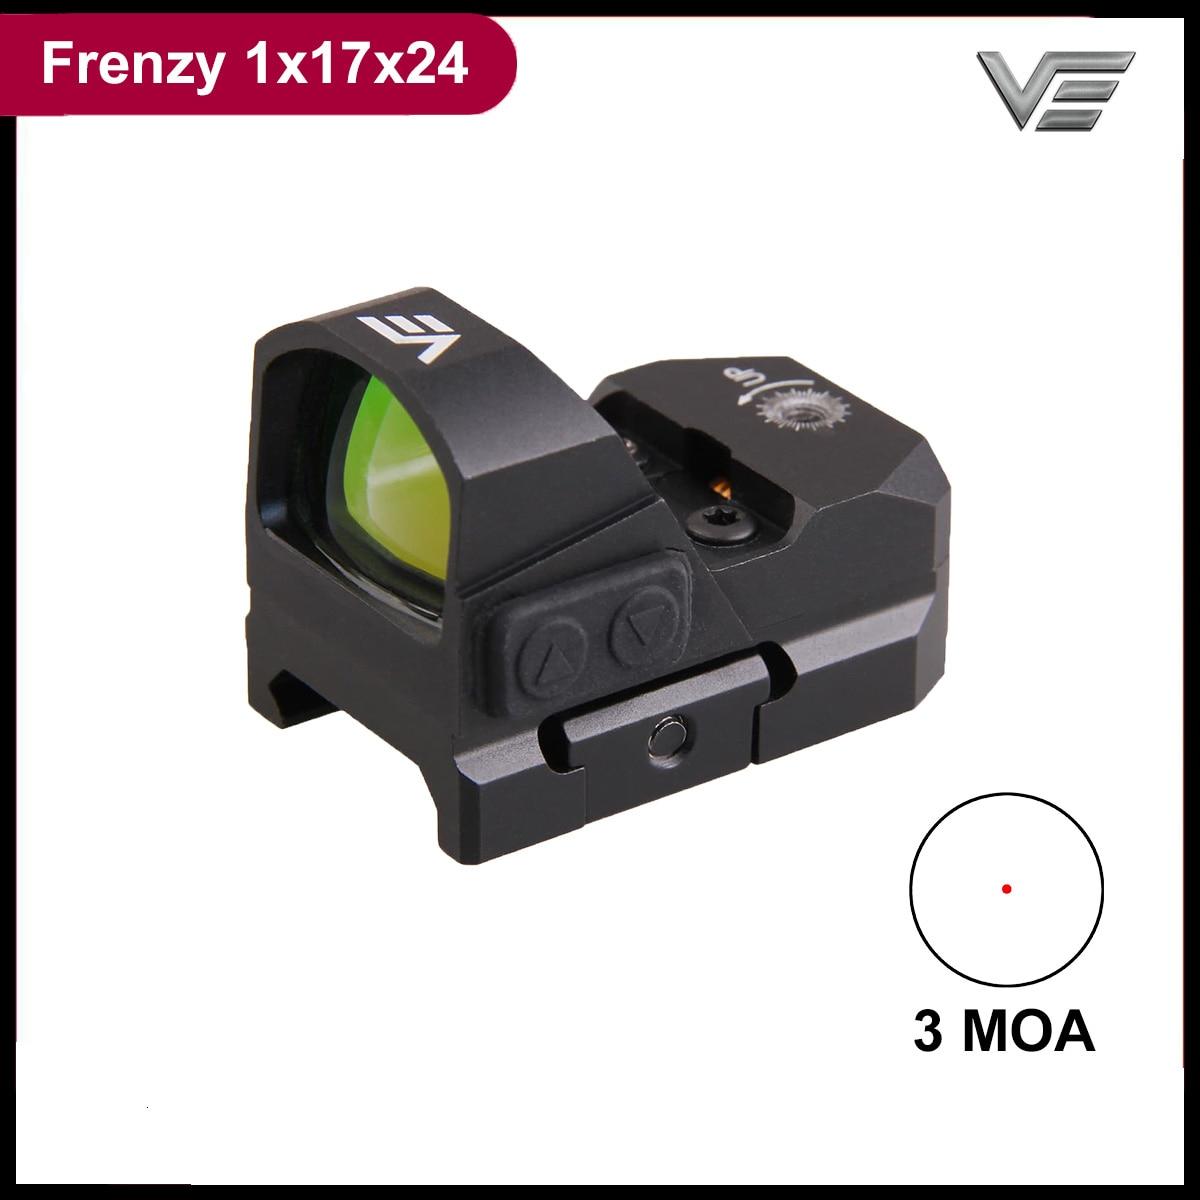 sistema otico do vetor frenzy 1x17x24 ar15 m4 ak47 pistola red dot scope 9mm mini vista